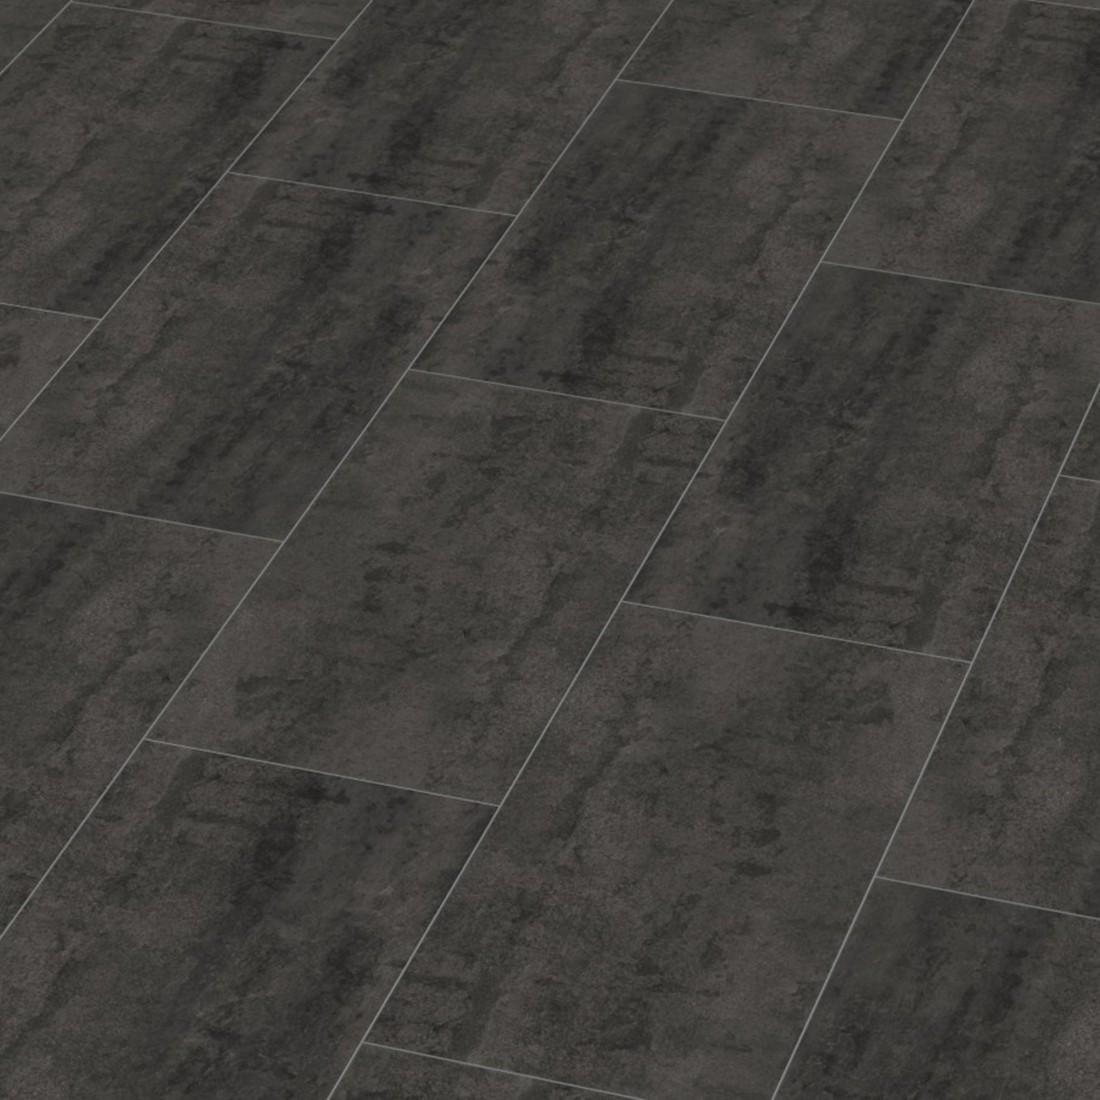 kronotex laminat mega d2869 dekor senia fliesenoptik inkl leisten und d mmung ebay. Black Bedroom Furniture Sets. Home Design Ideas